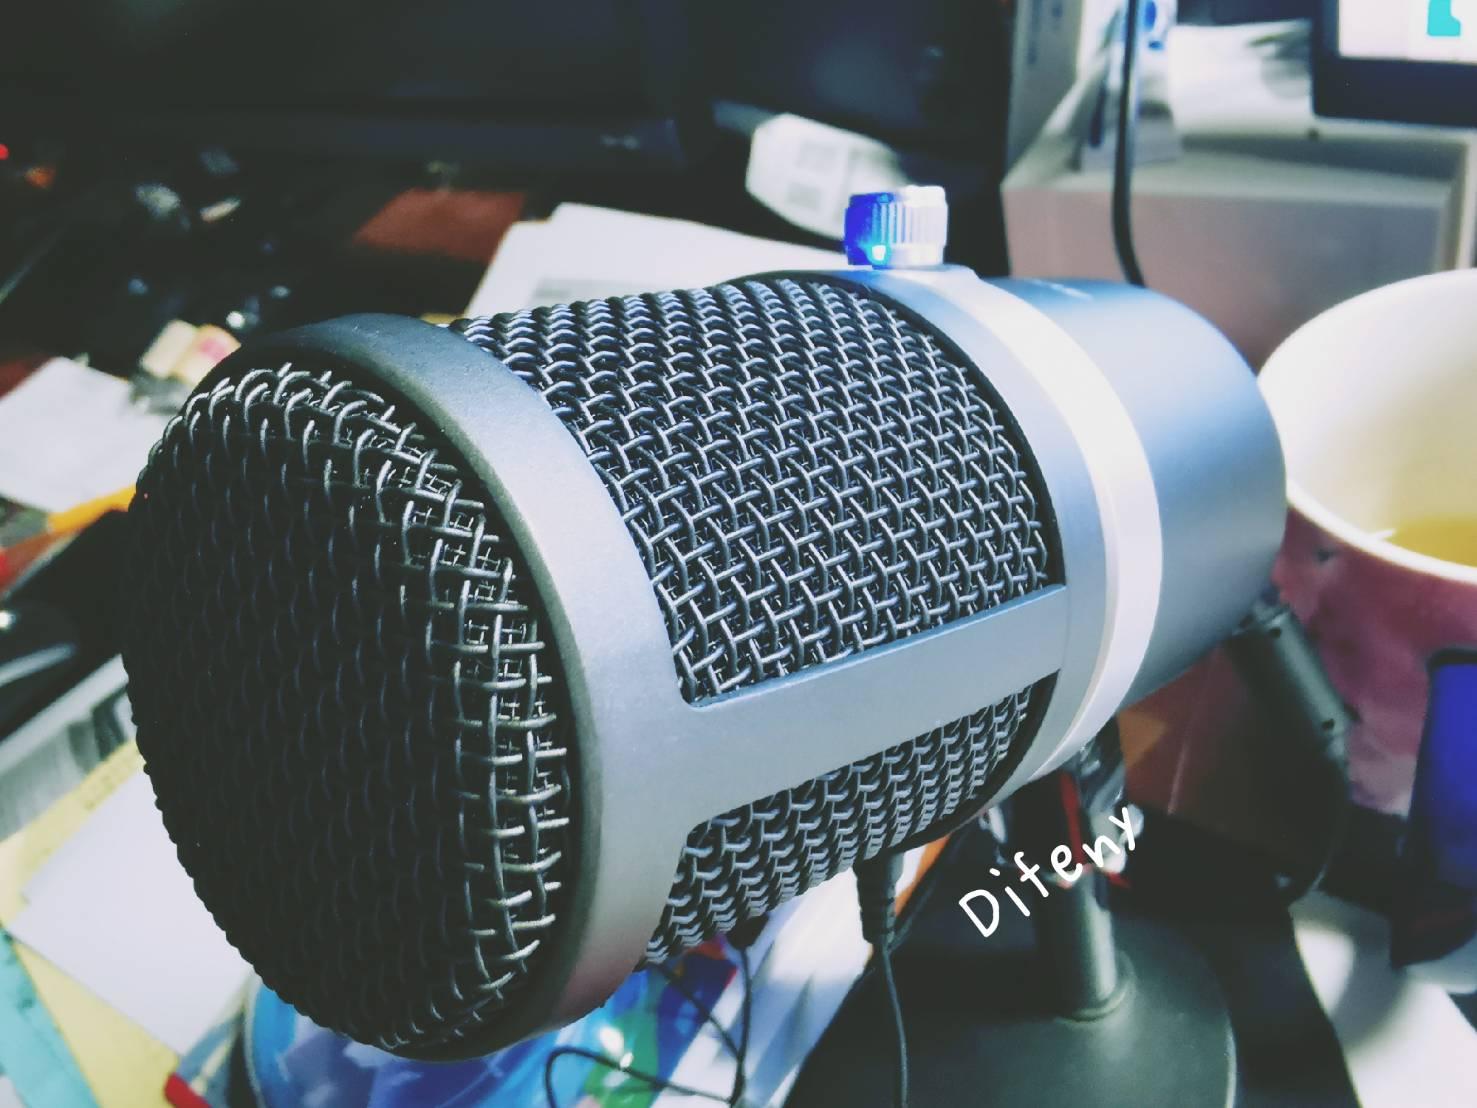 Podcast學習紀錄|為什麼要錄podcast?這個到底在紅什麼? @走走停停,小燈泡在旅行